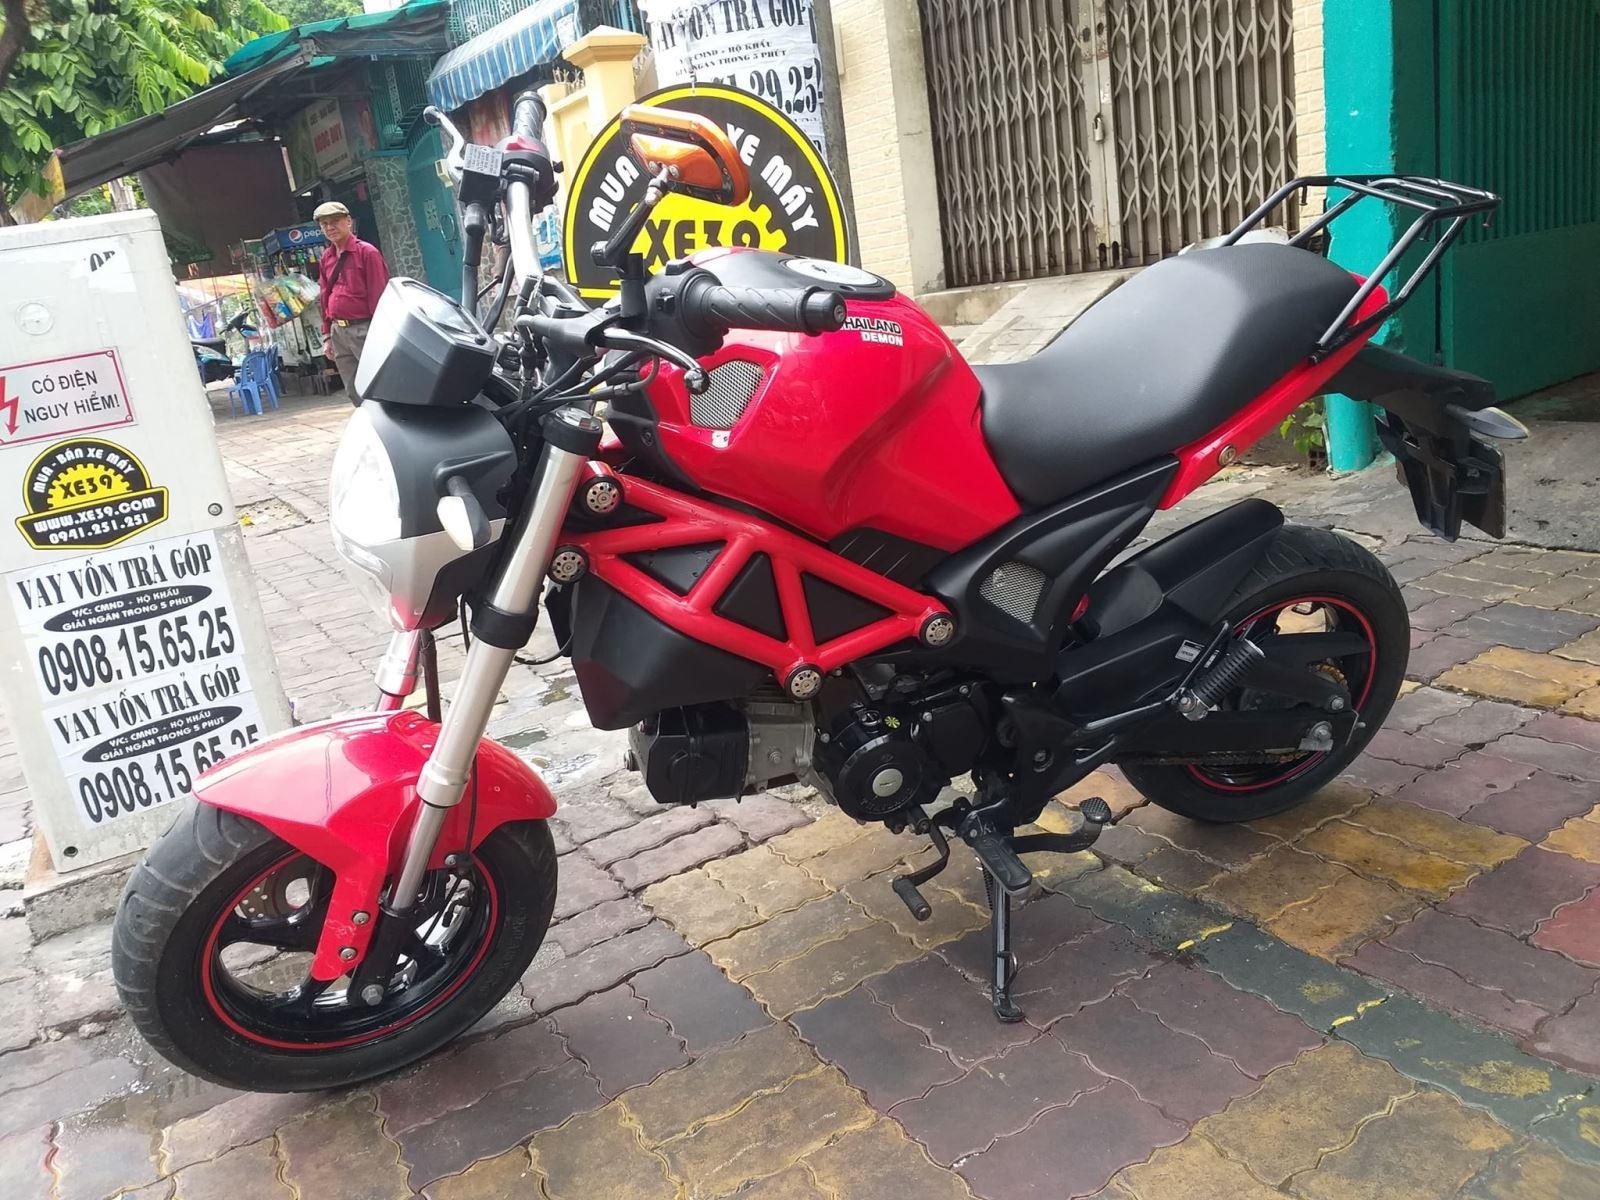 Ducati Mini Monster 110cc côn tay 2017 bs 81 - bán 13tr5